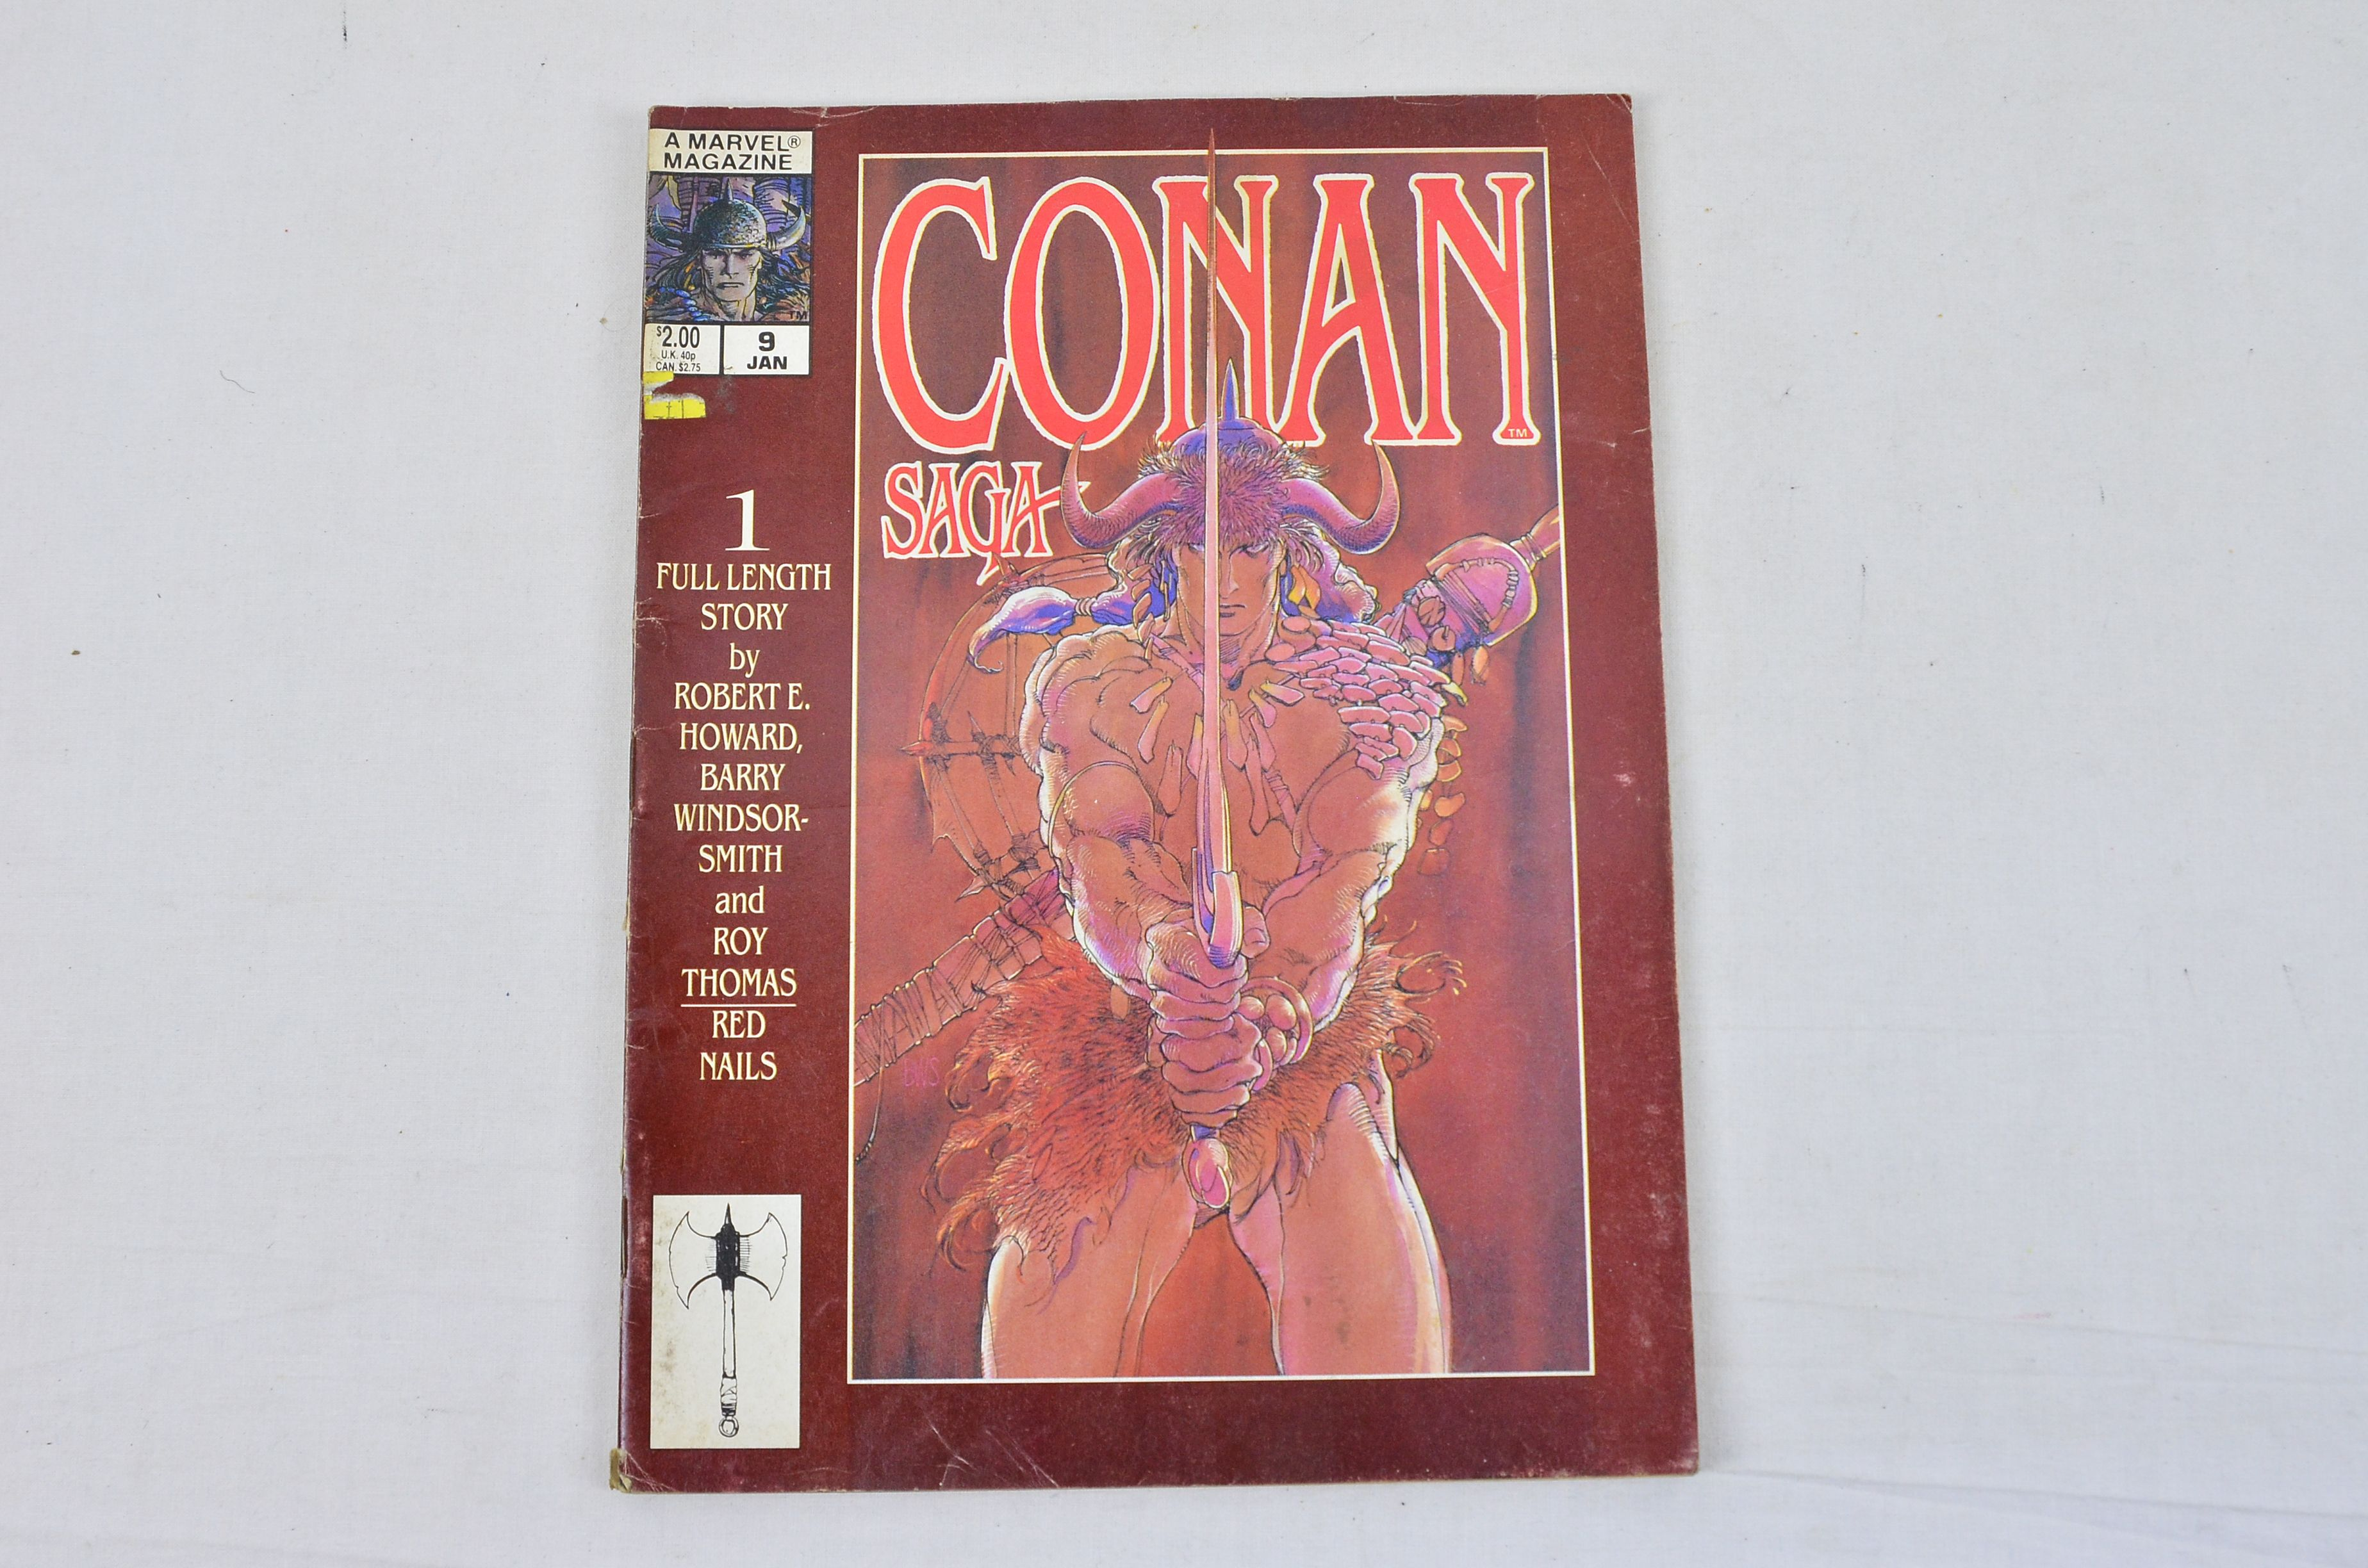 Vintage Marvel Comics Group Conan Saga Number 9 Collectable Comic Thumbnail 1